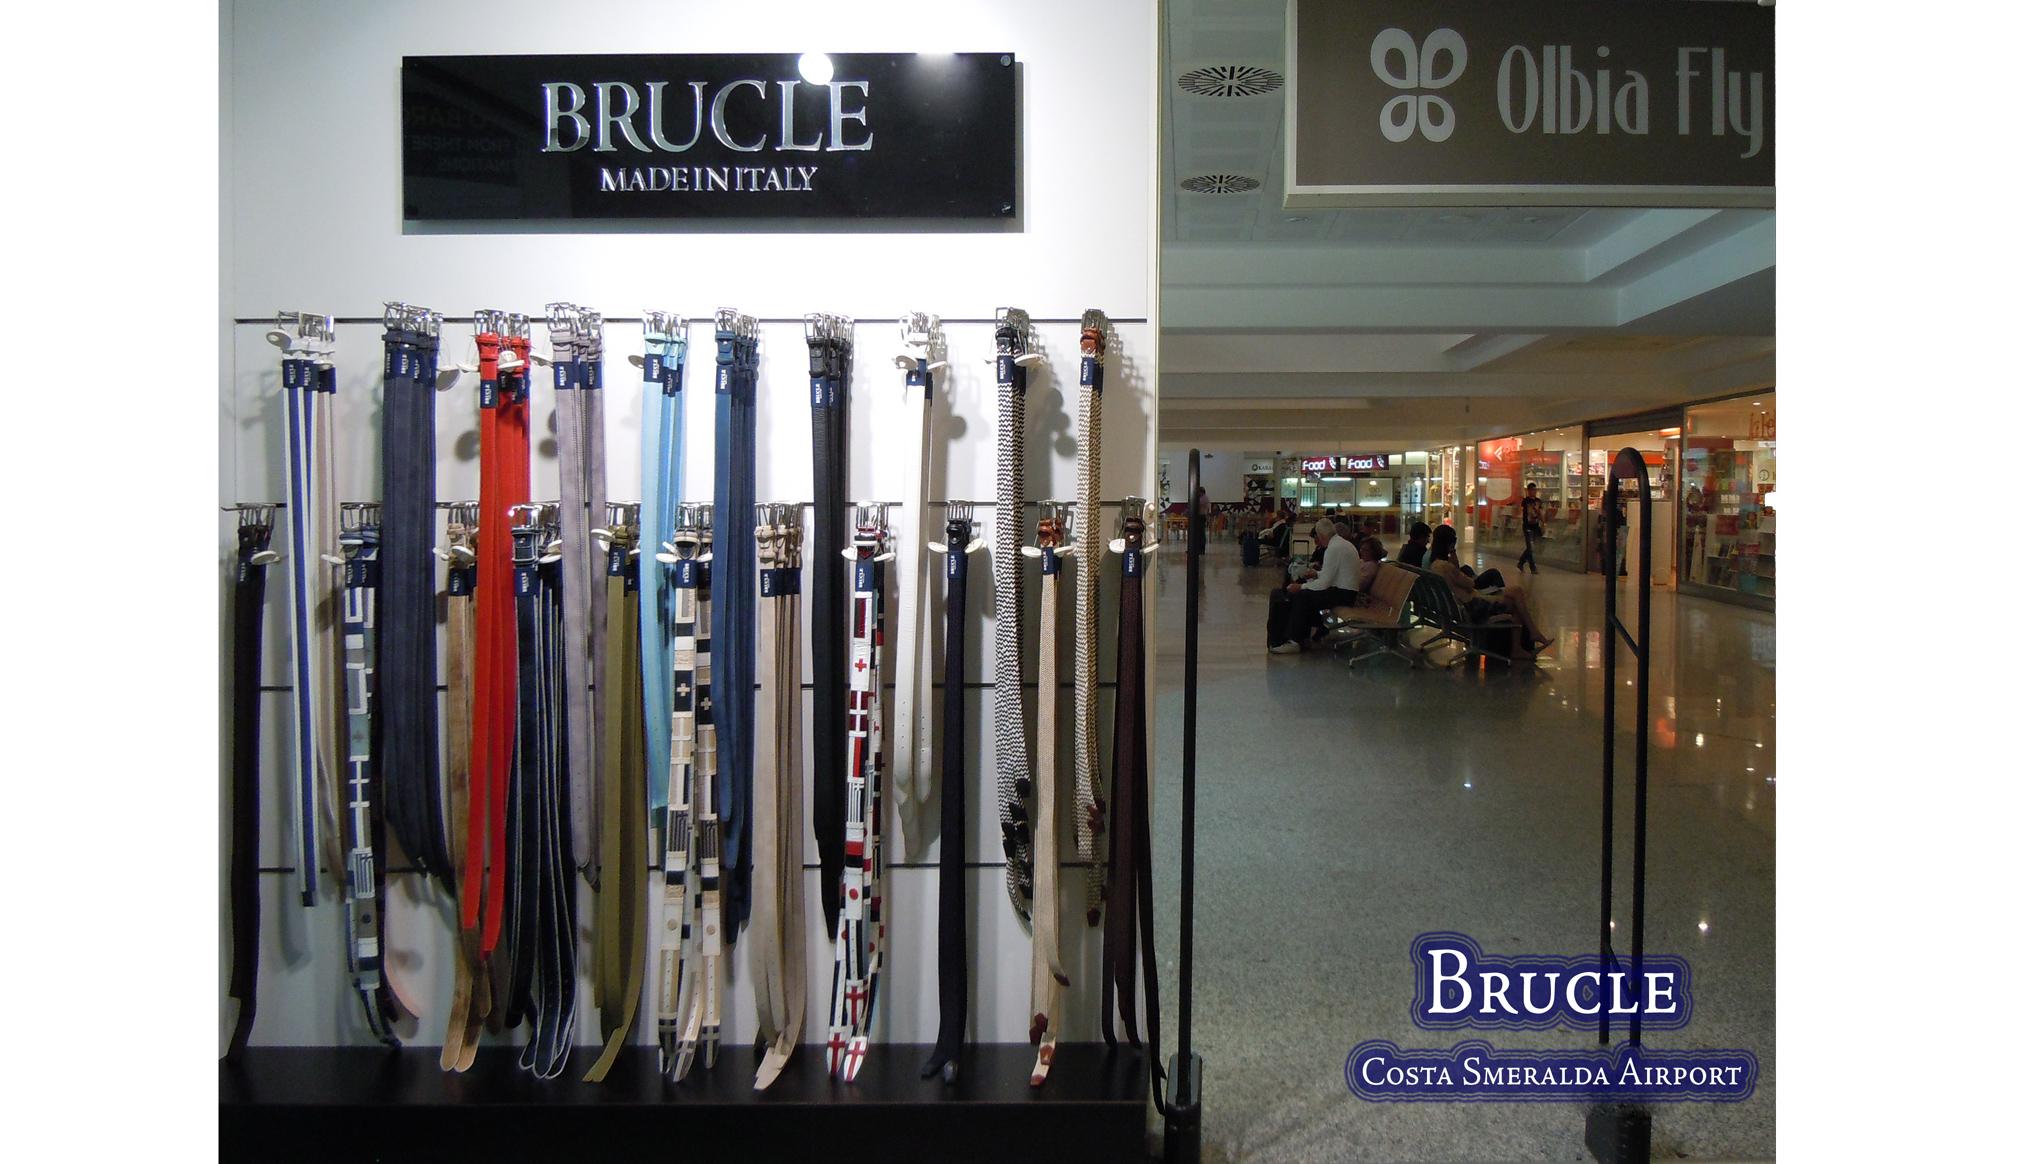 New Cornee Shop Brucle Belts